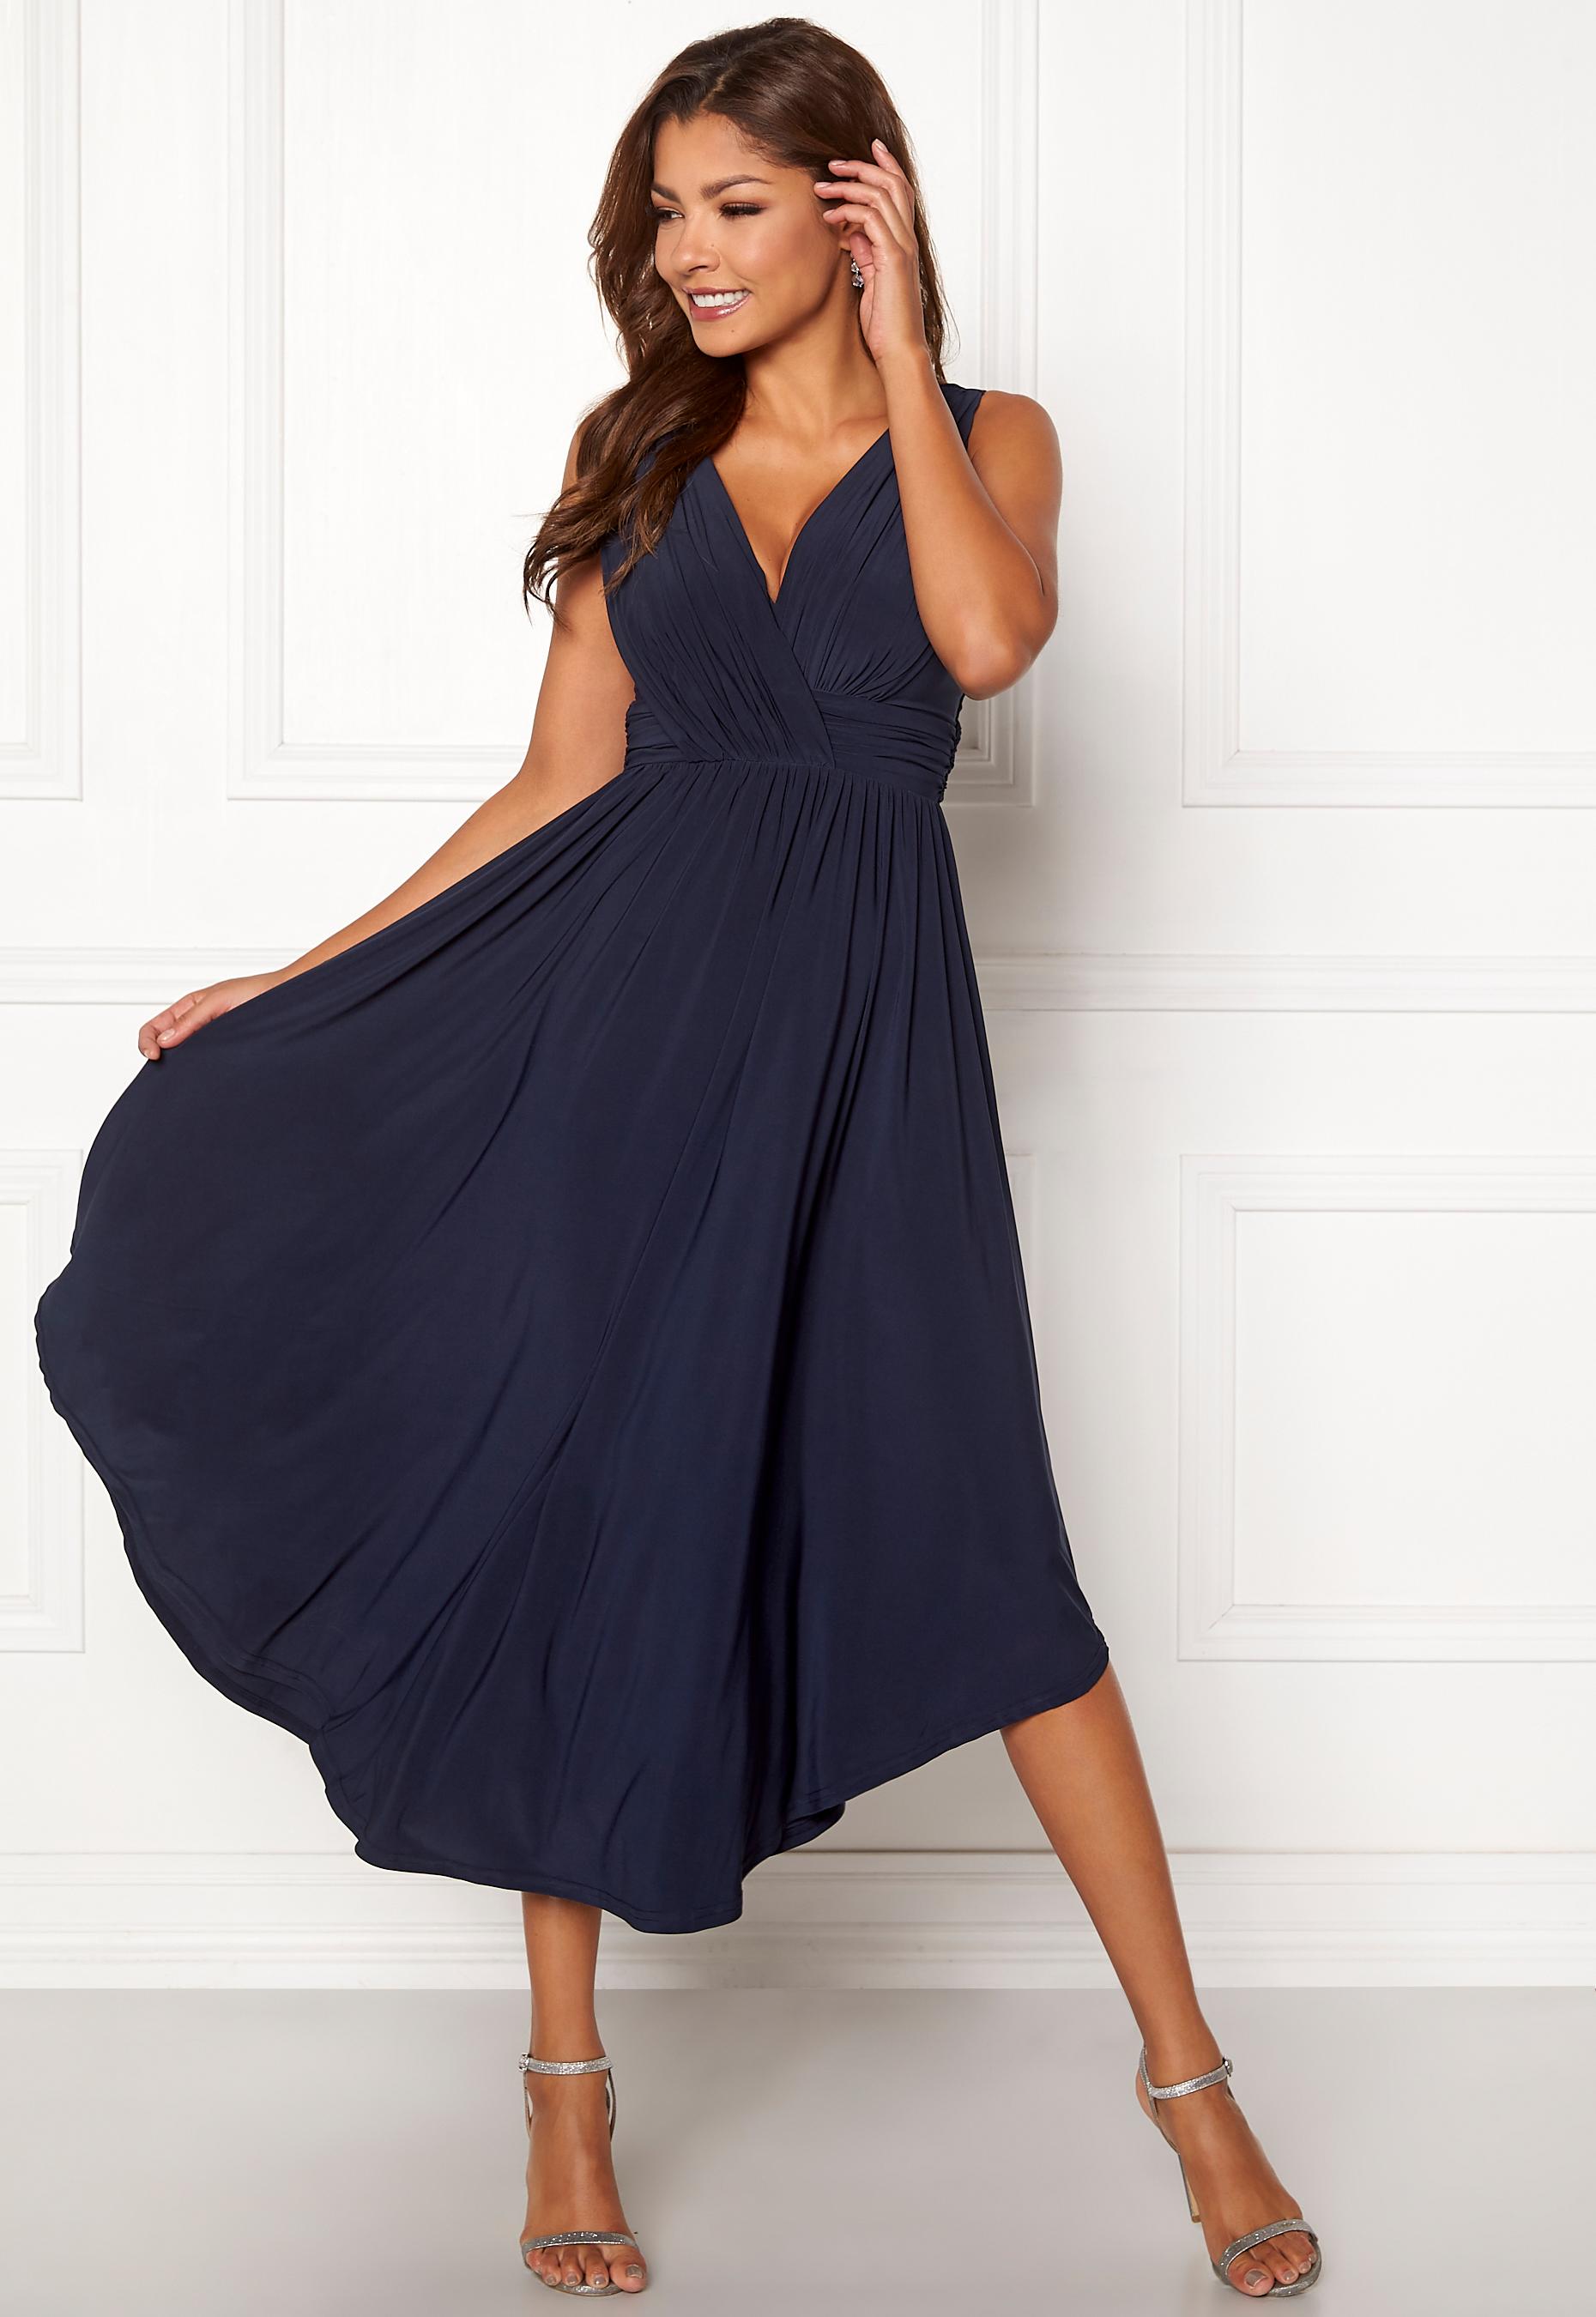 8358670e229 Chiara Forthi Valeria Dress Dark blue - Bubbleroom